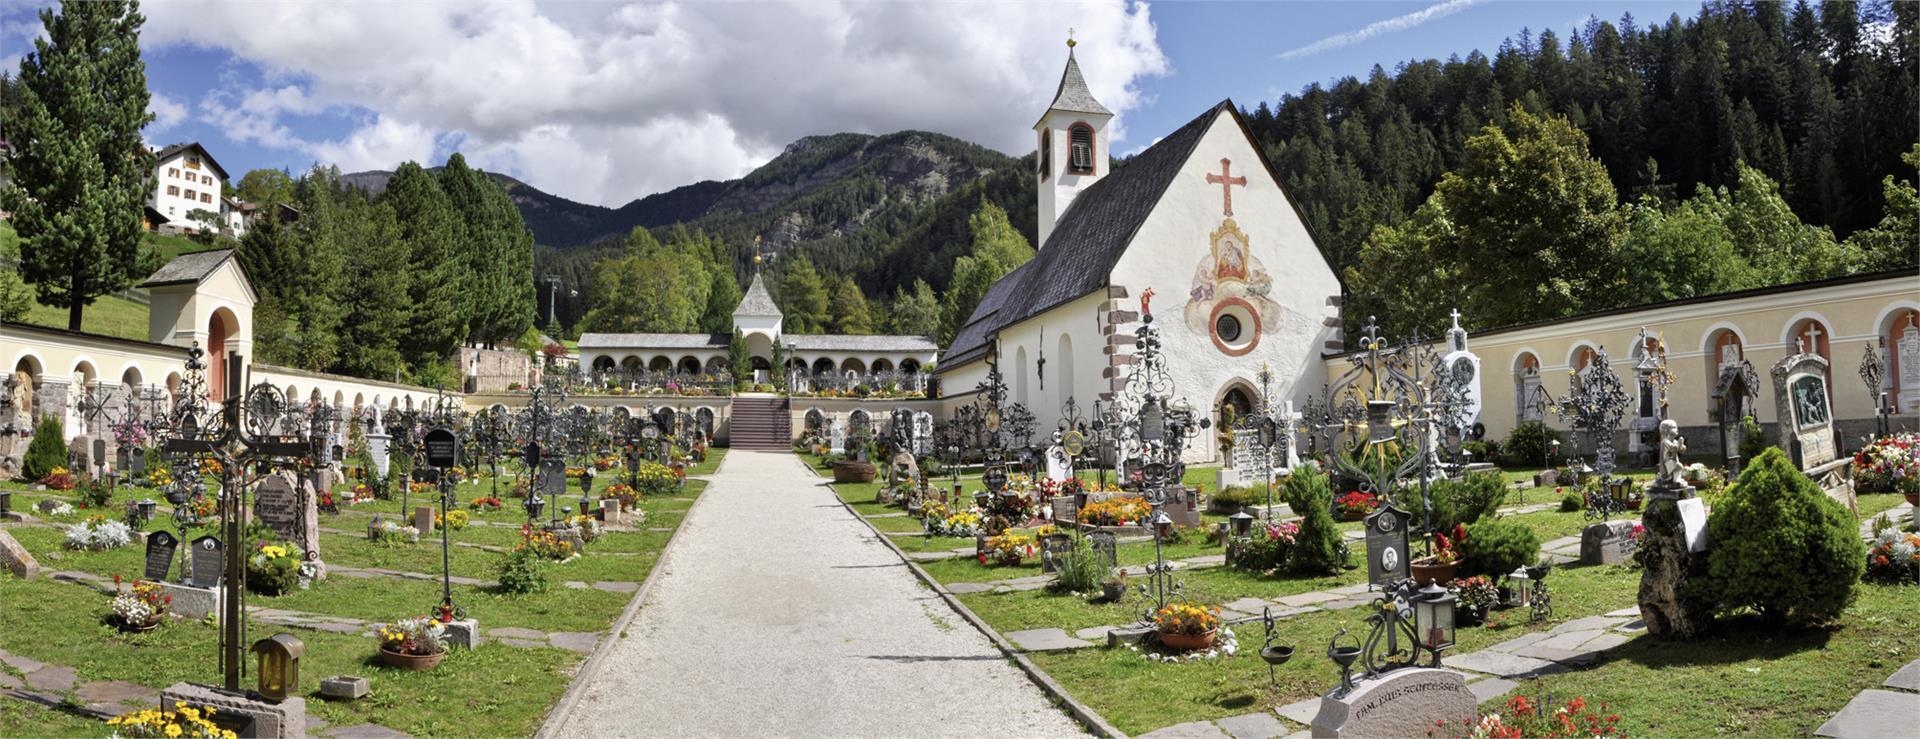 St. Anna's Chapel